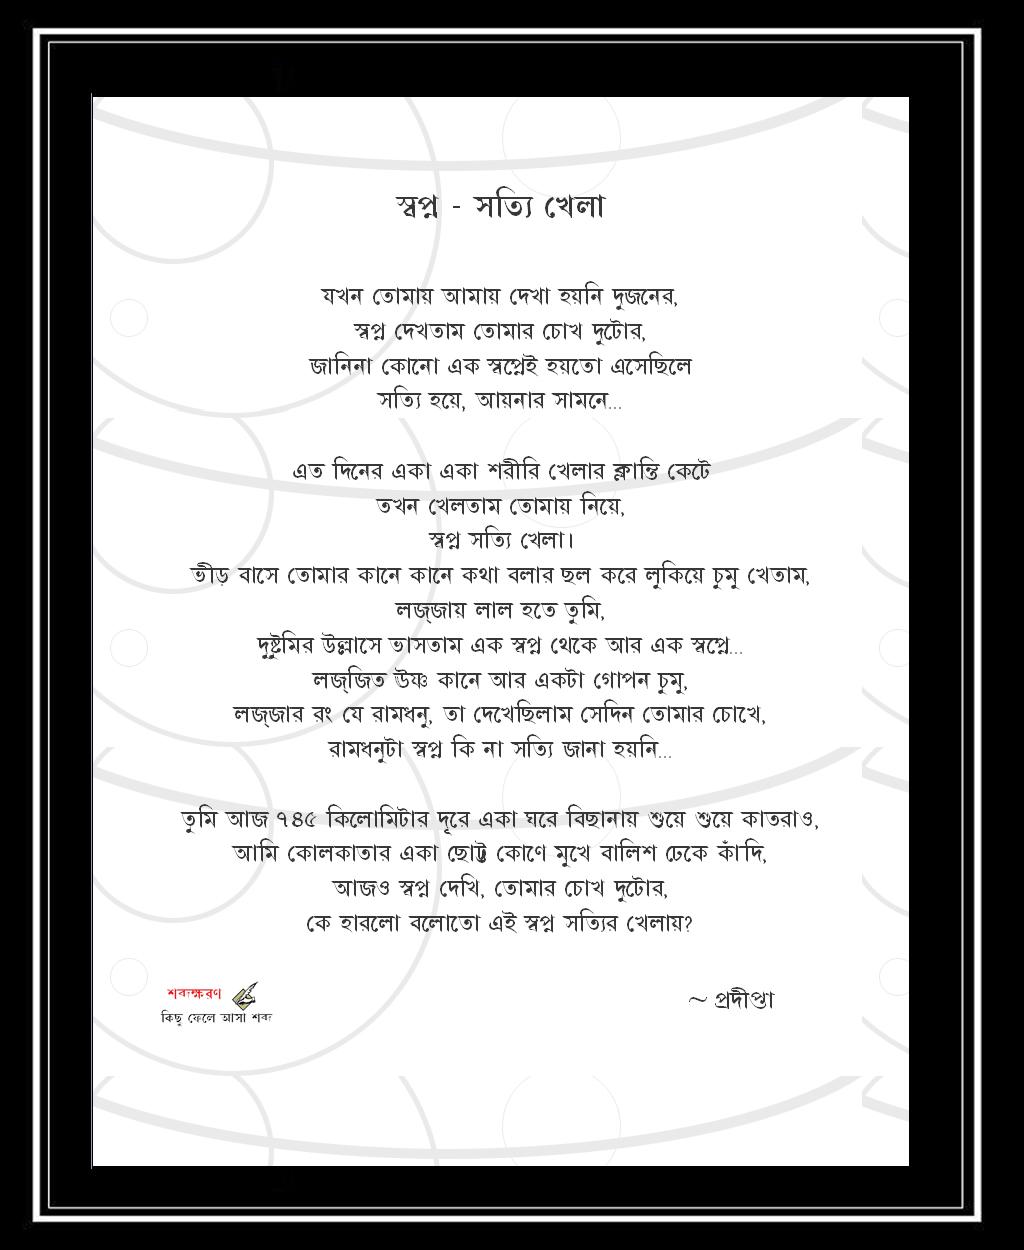 Bangla Choda Chudir Golpo Bangla Font